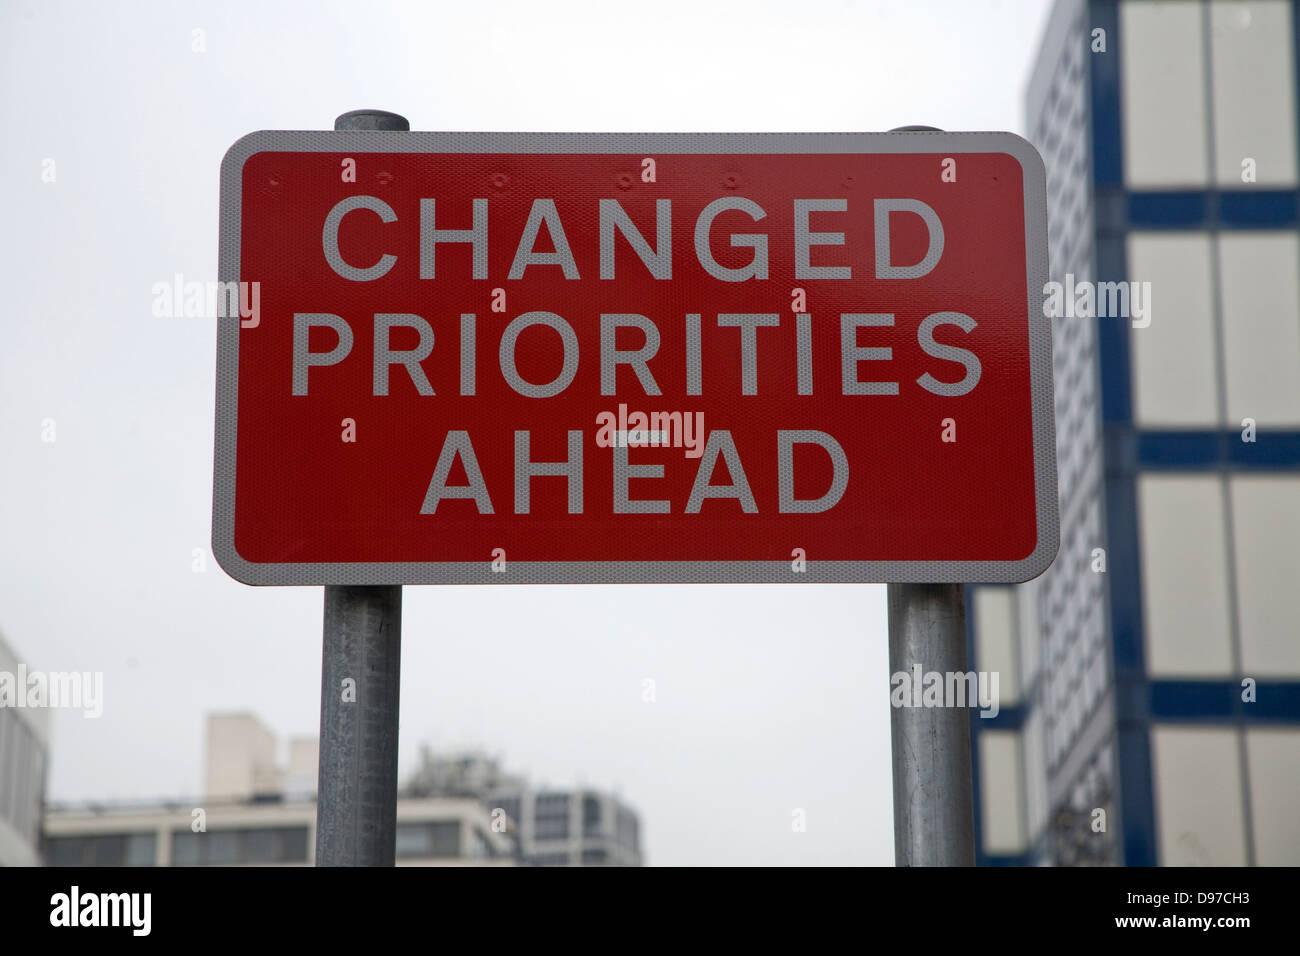 Sign for Changed Priorities Ahead Swindon, Wiltshire, England, UK - Stock Image